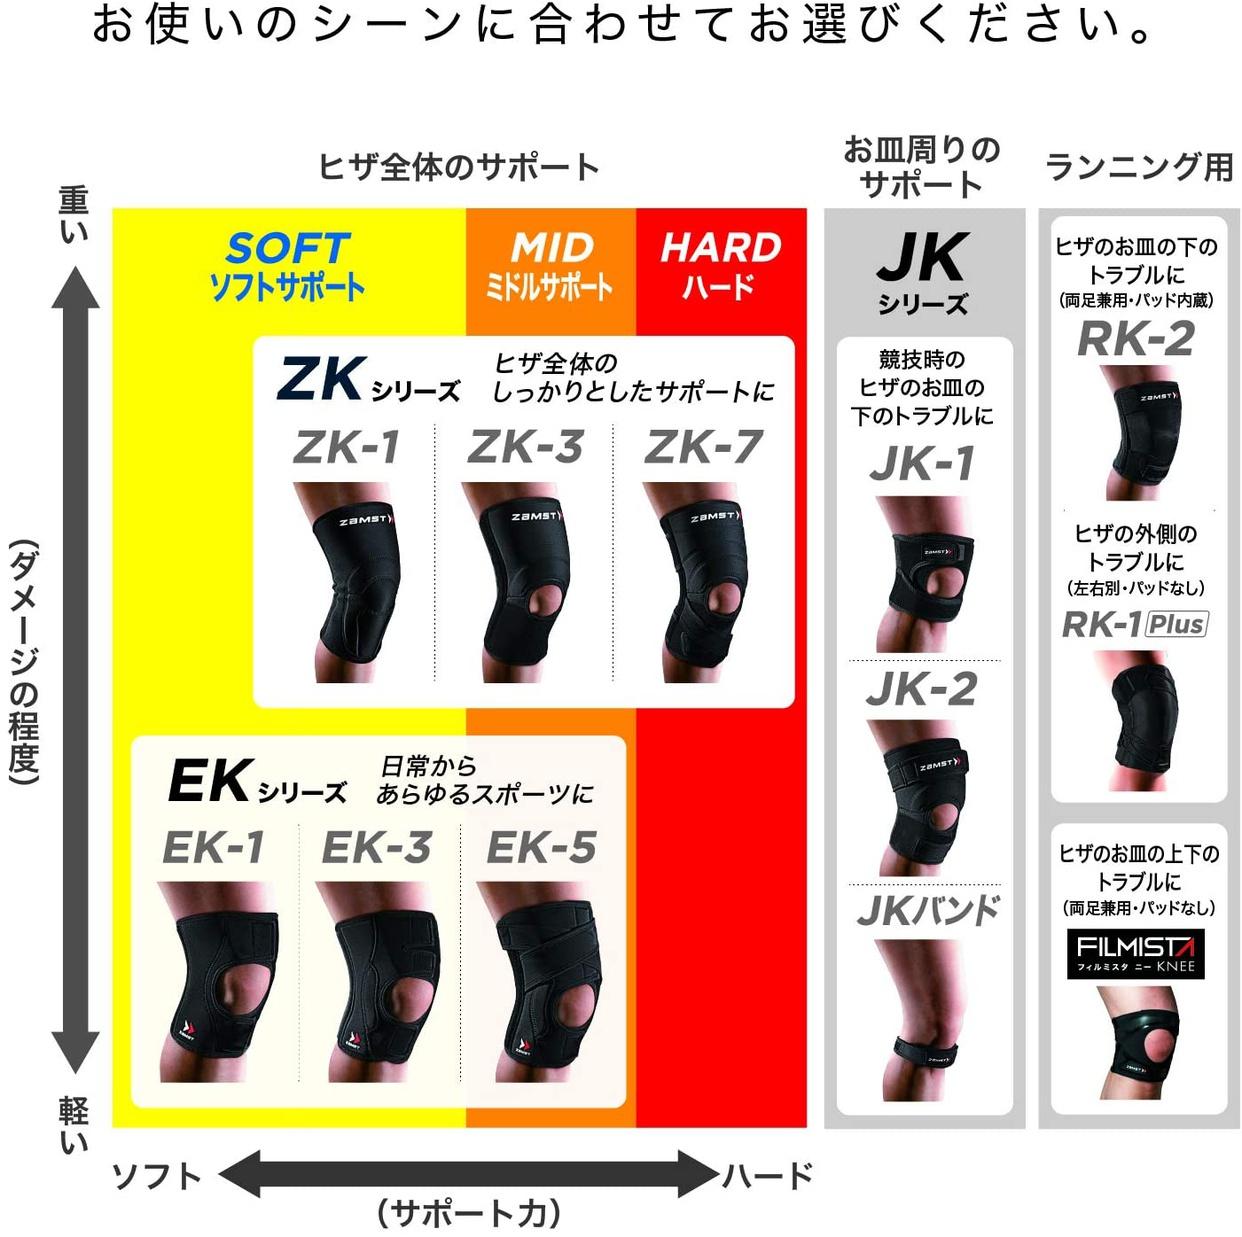 ZAMST(ザムスト) 膝用サポーター RK-1Plusの商品画像7